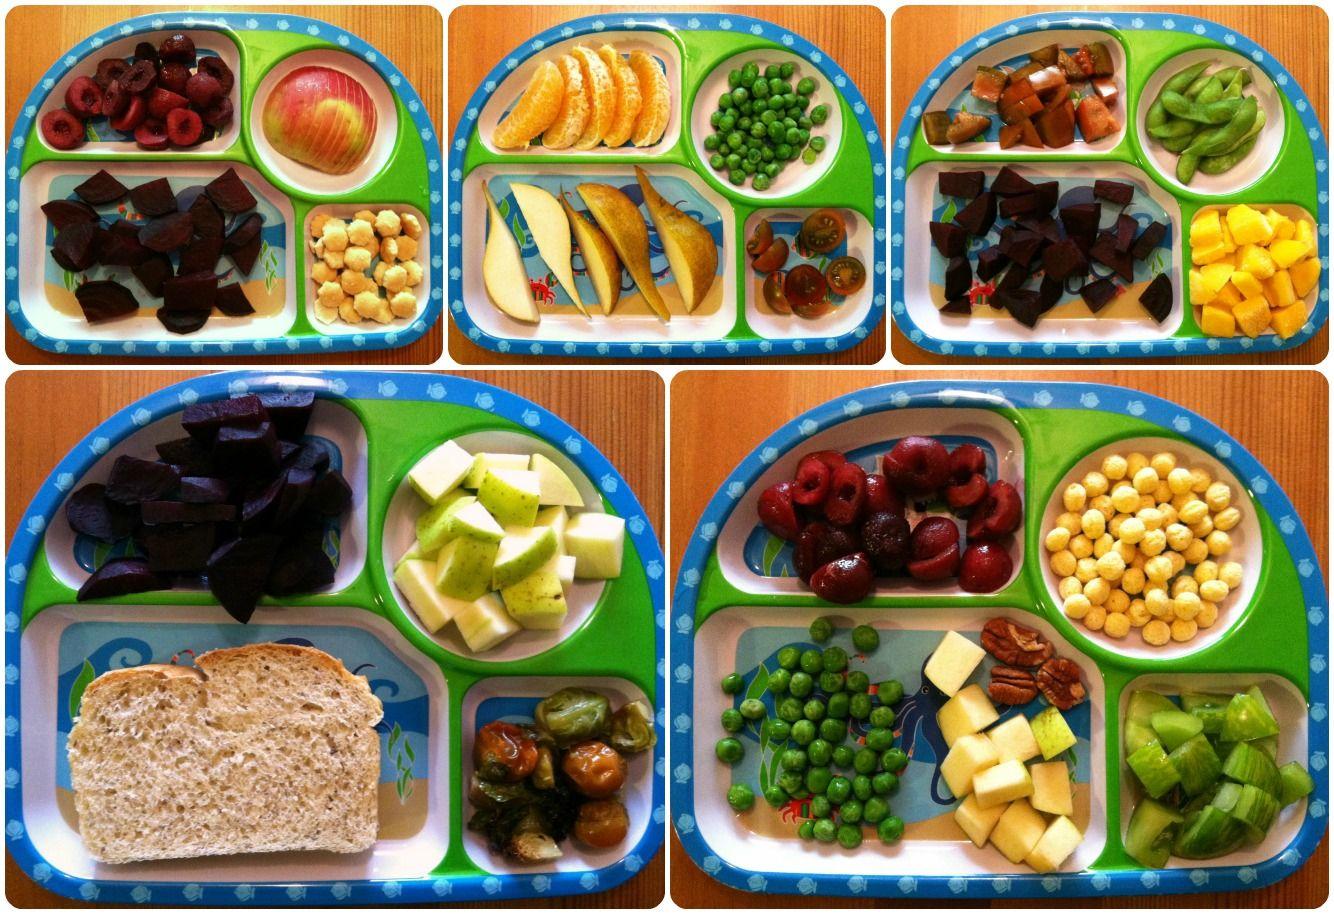 Vegan Mother Hubbard Vegan Toddler Meals Vegan Kids Vegan Recipes Healthy Vegan Eating